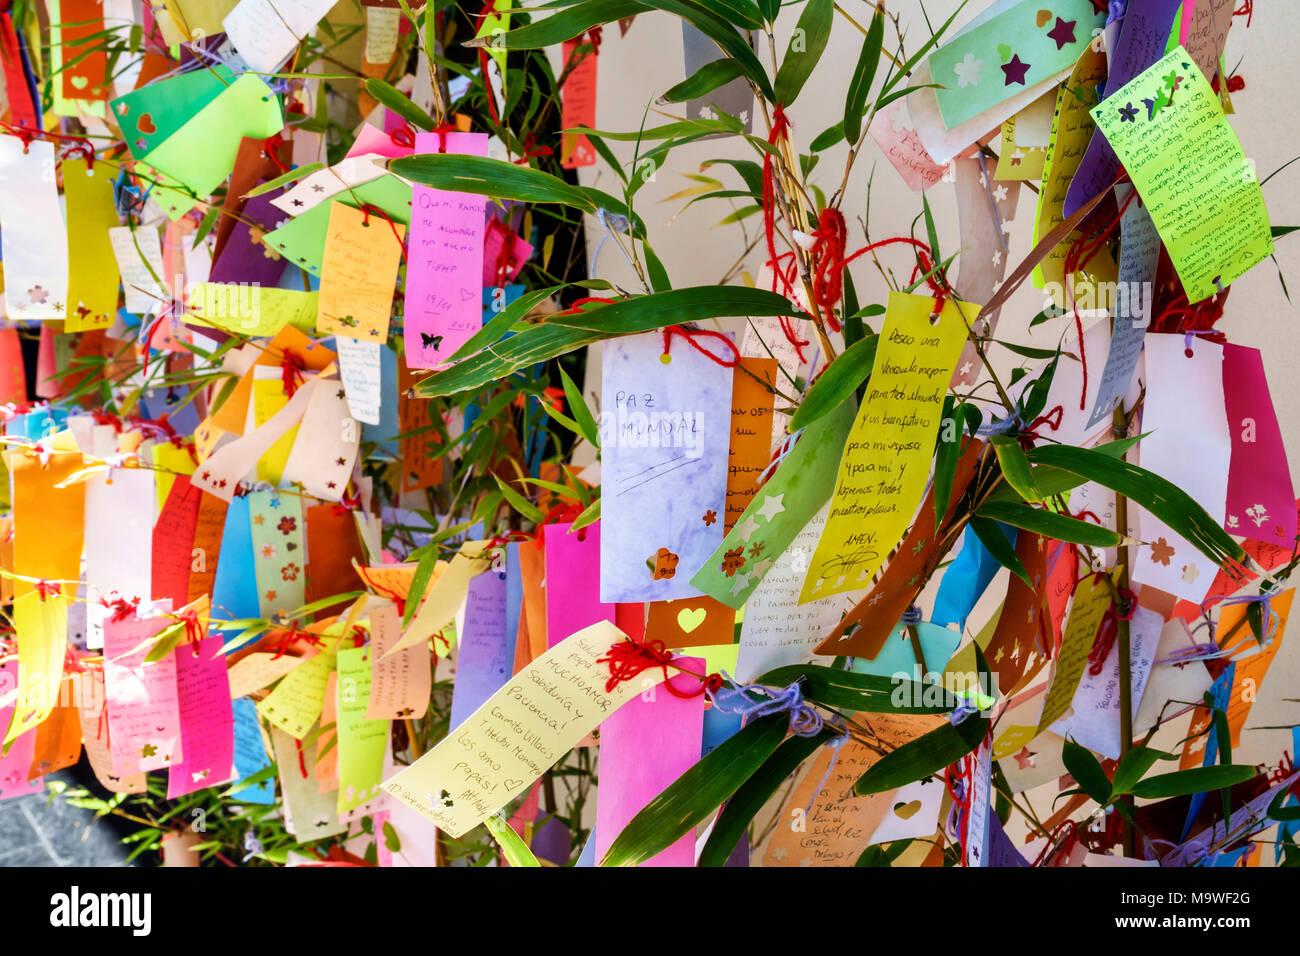 Buenos Aires Argentina,Recoleta,Japanese Garden Jardin Japones,botanical,wish tree,Tanzaku hanging on bamboo,colorful paper,Hispanic,ARG171130081 Stock Photo